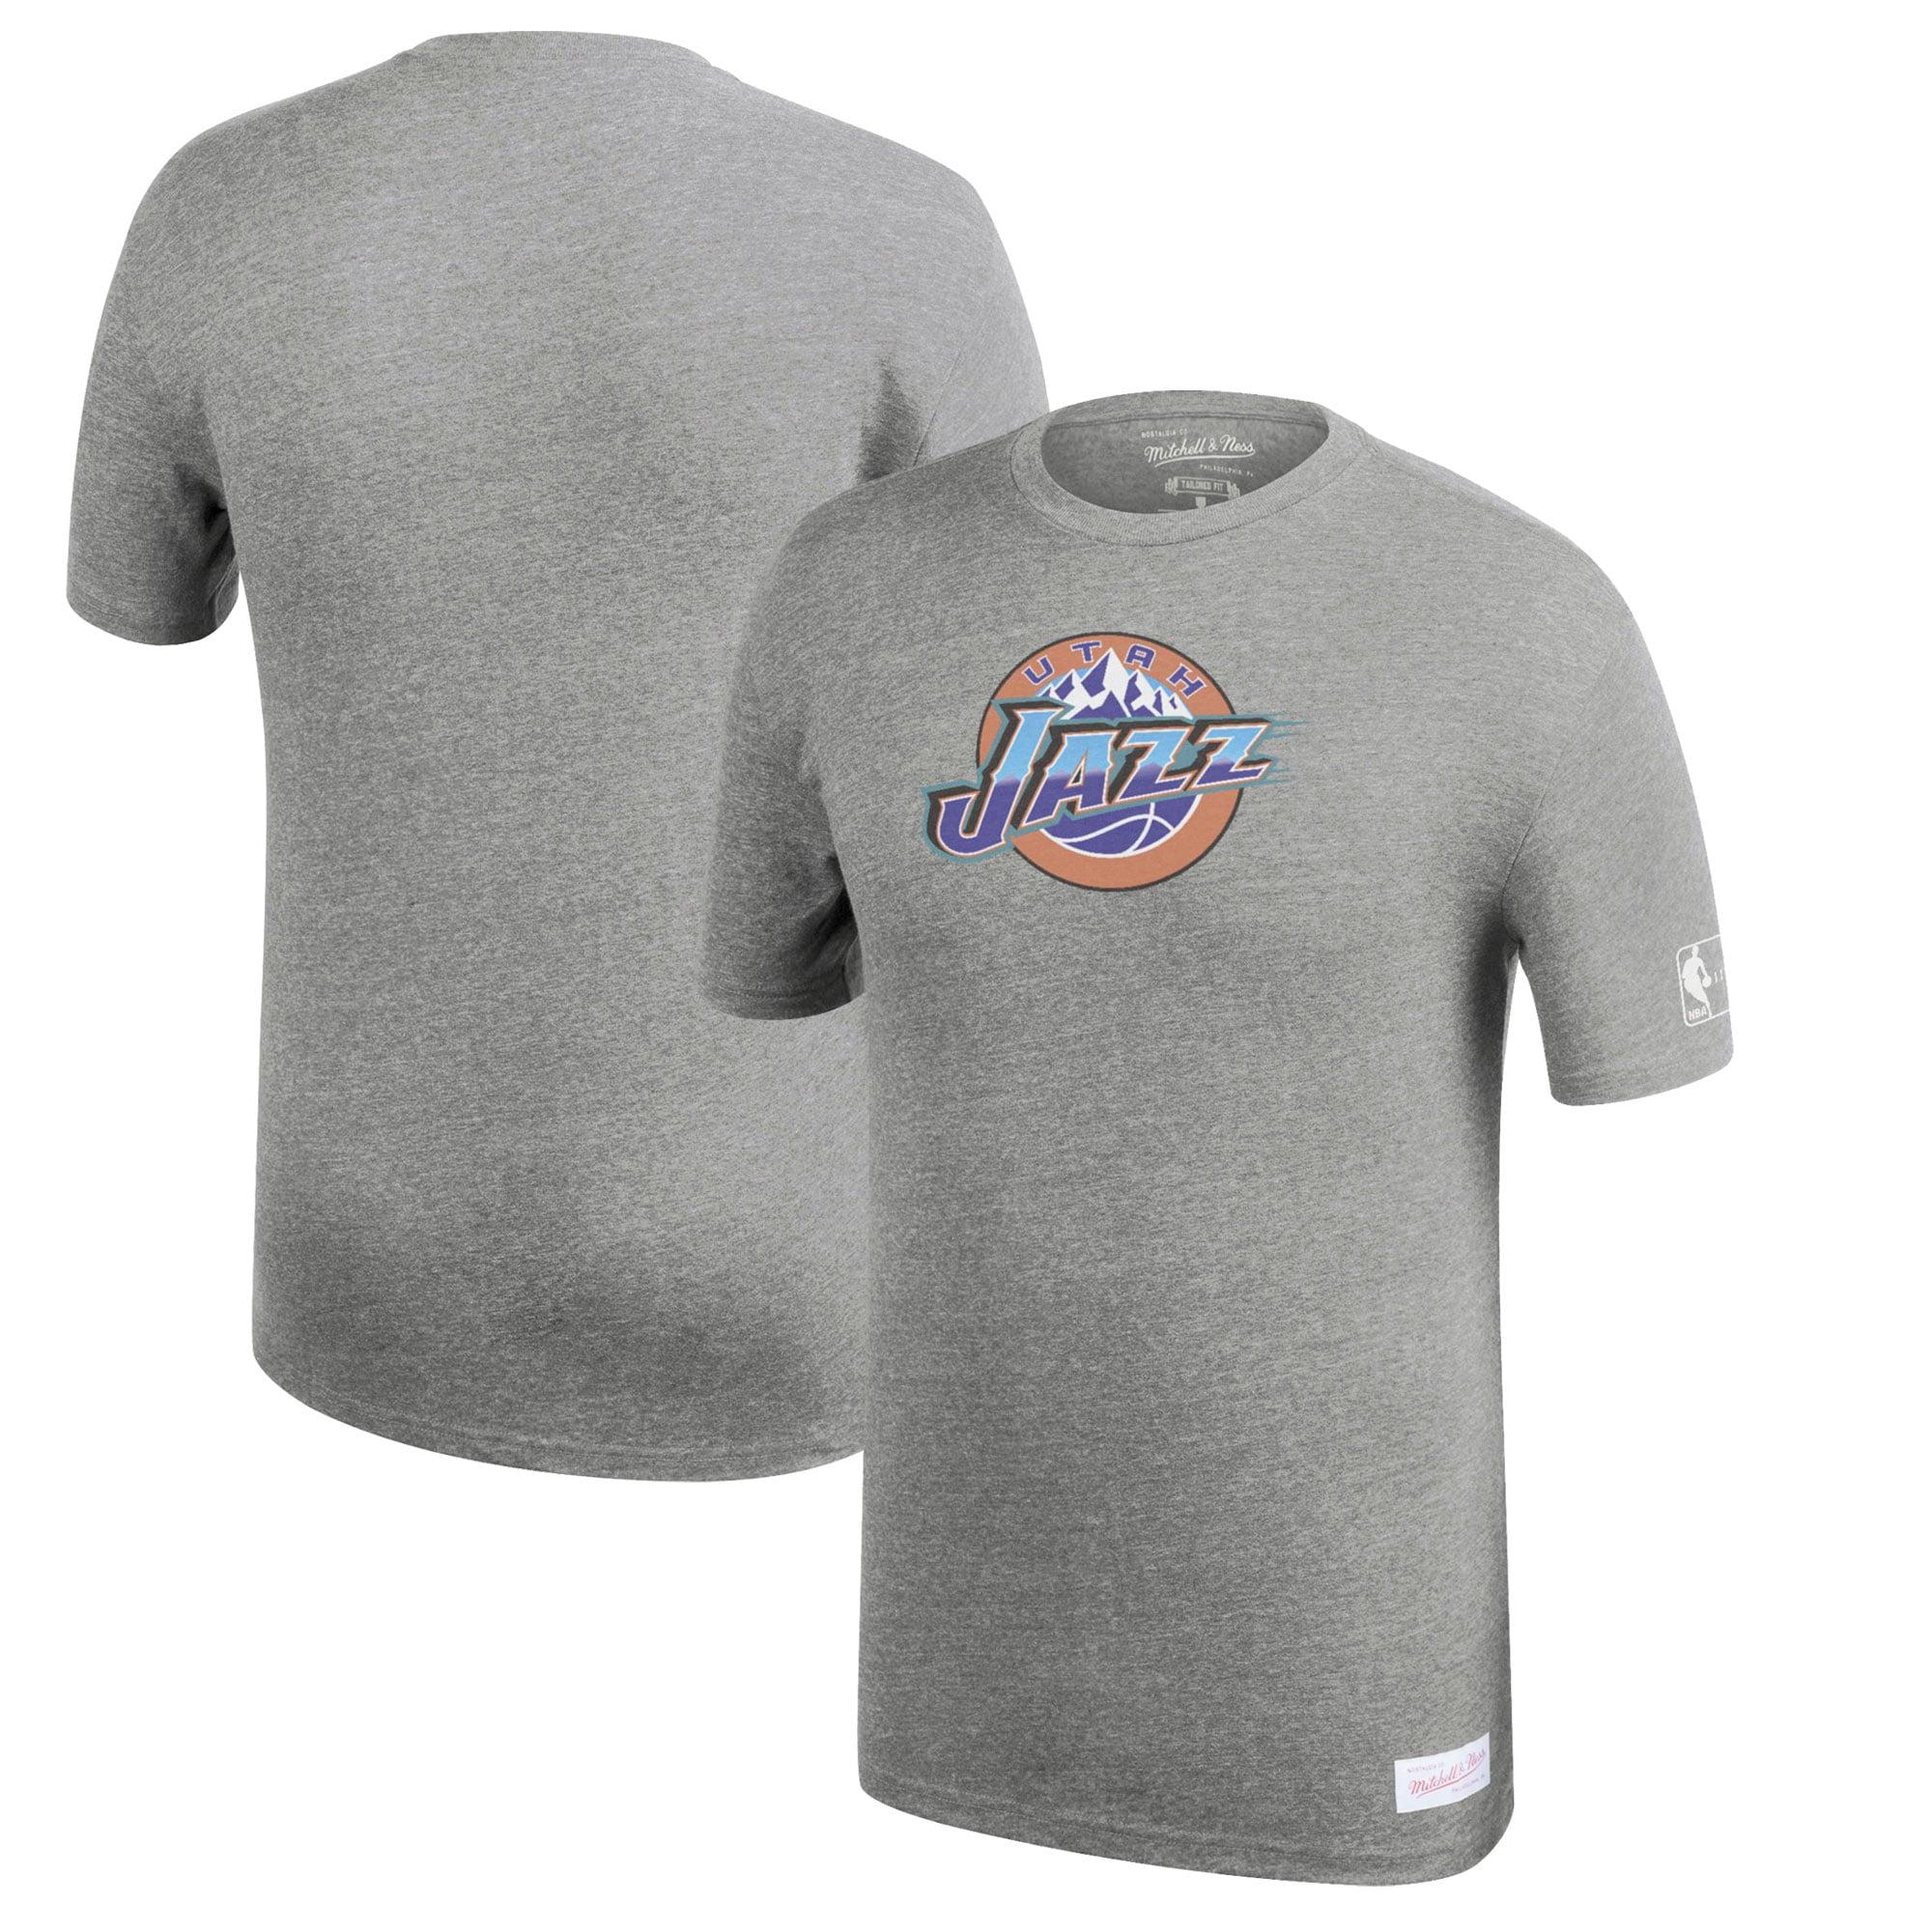 Utah Jazz Mitchell & Ness Hardwood Classics Throwback Logo Tri-Blend T-Shirt - Heathered Gray